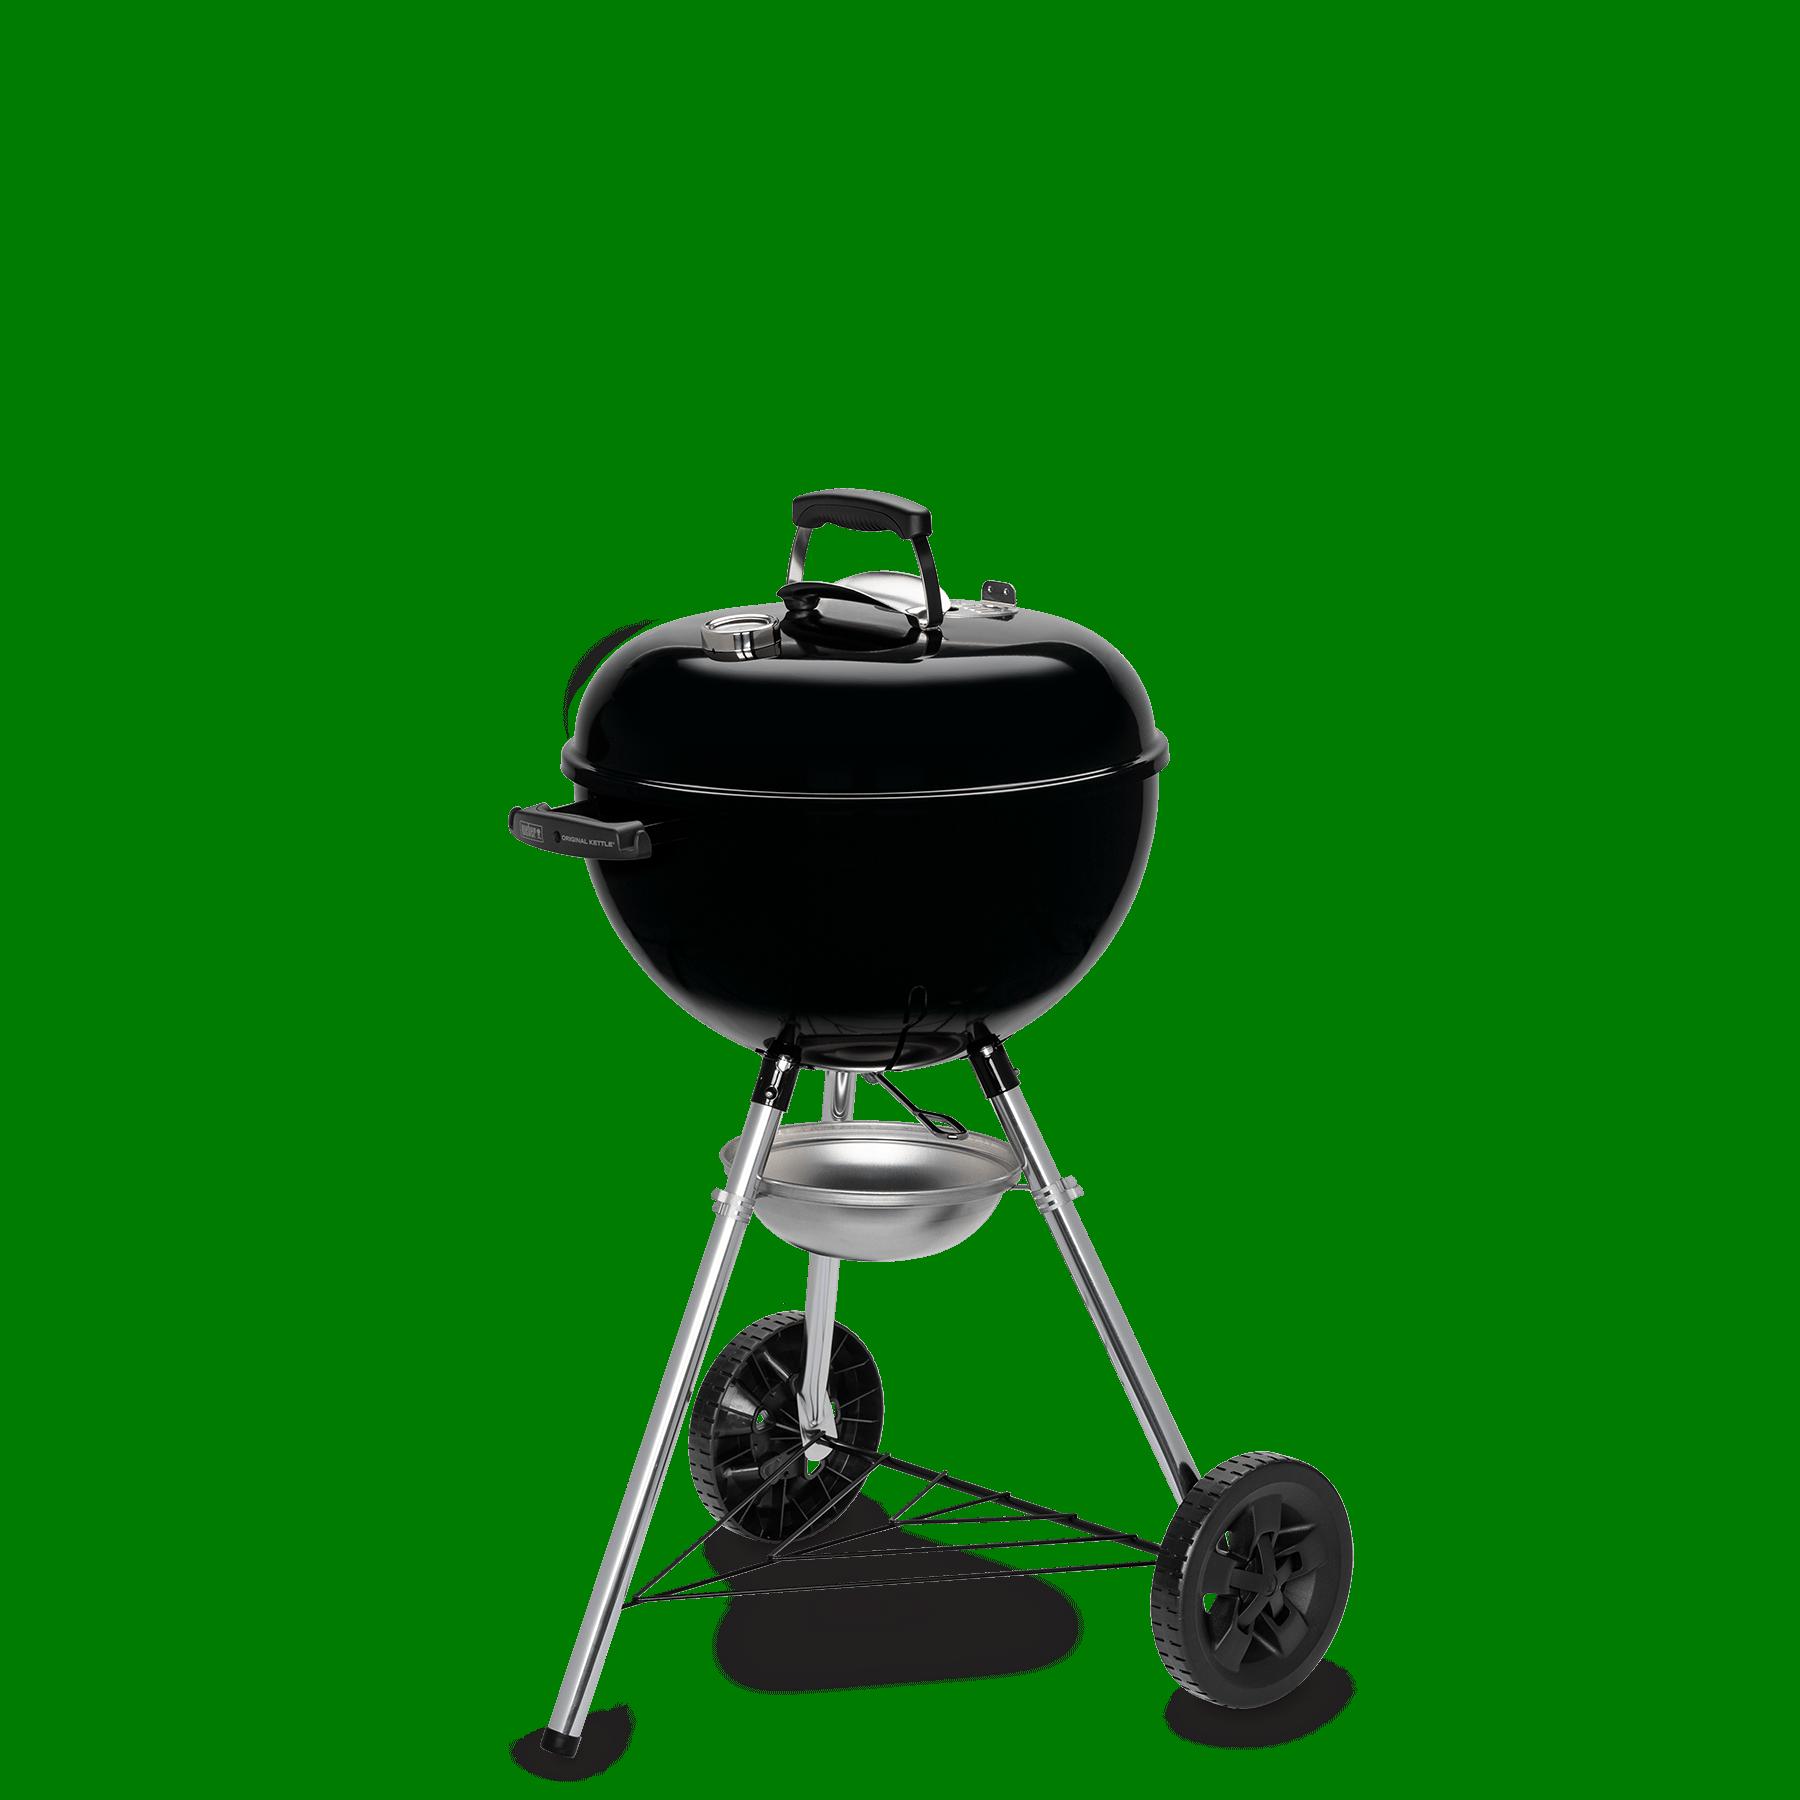 Original Kettle E-4710 Charcoal Barbecue 47 cm